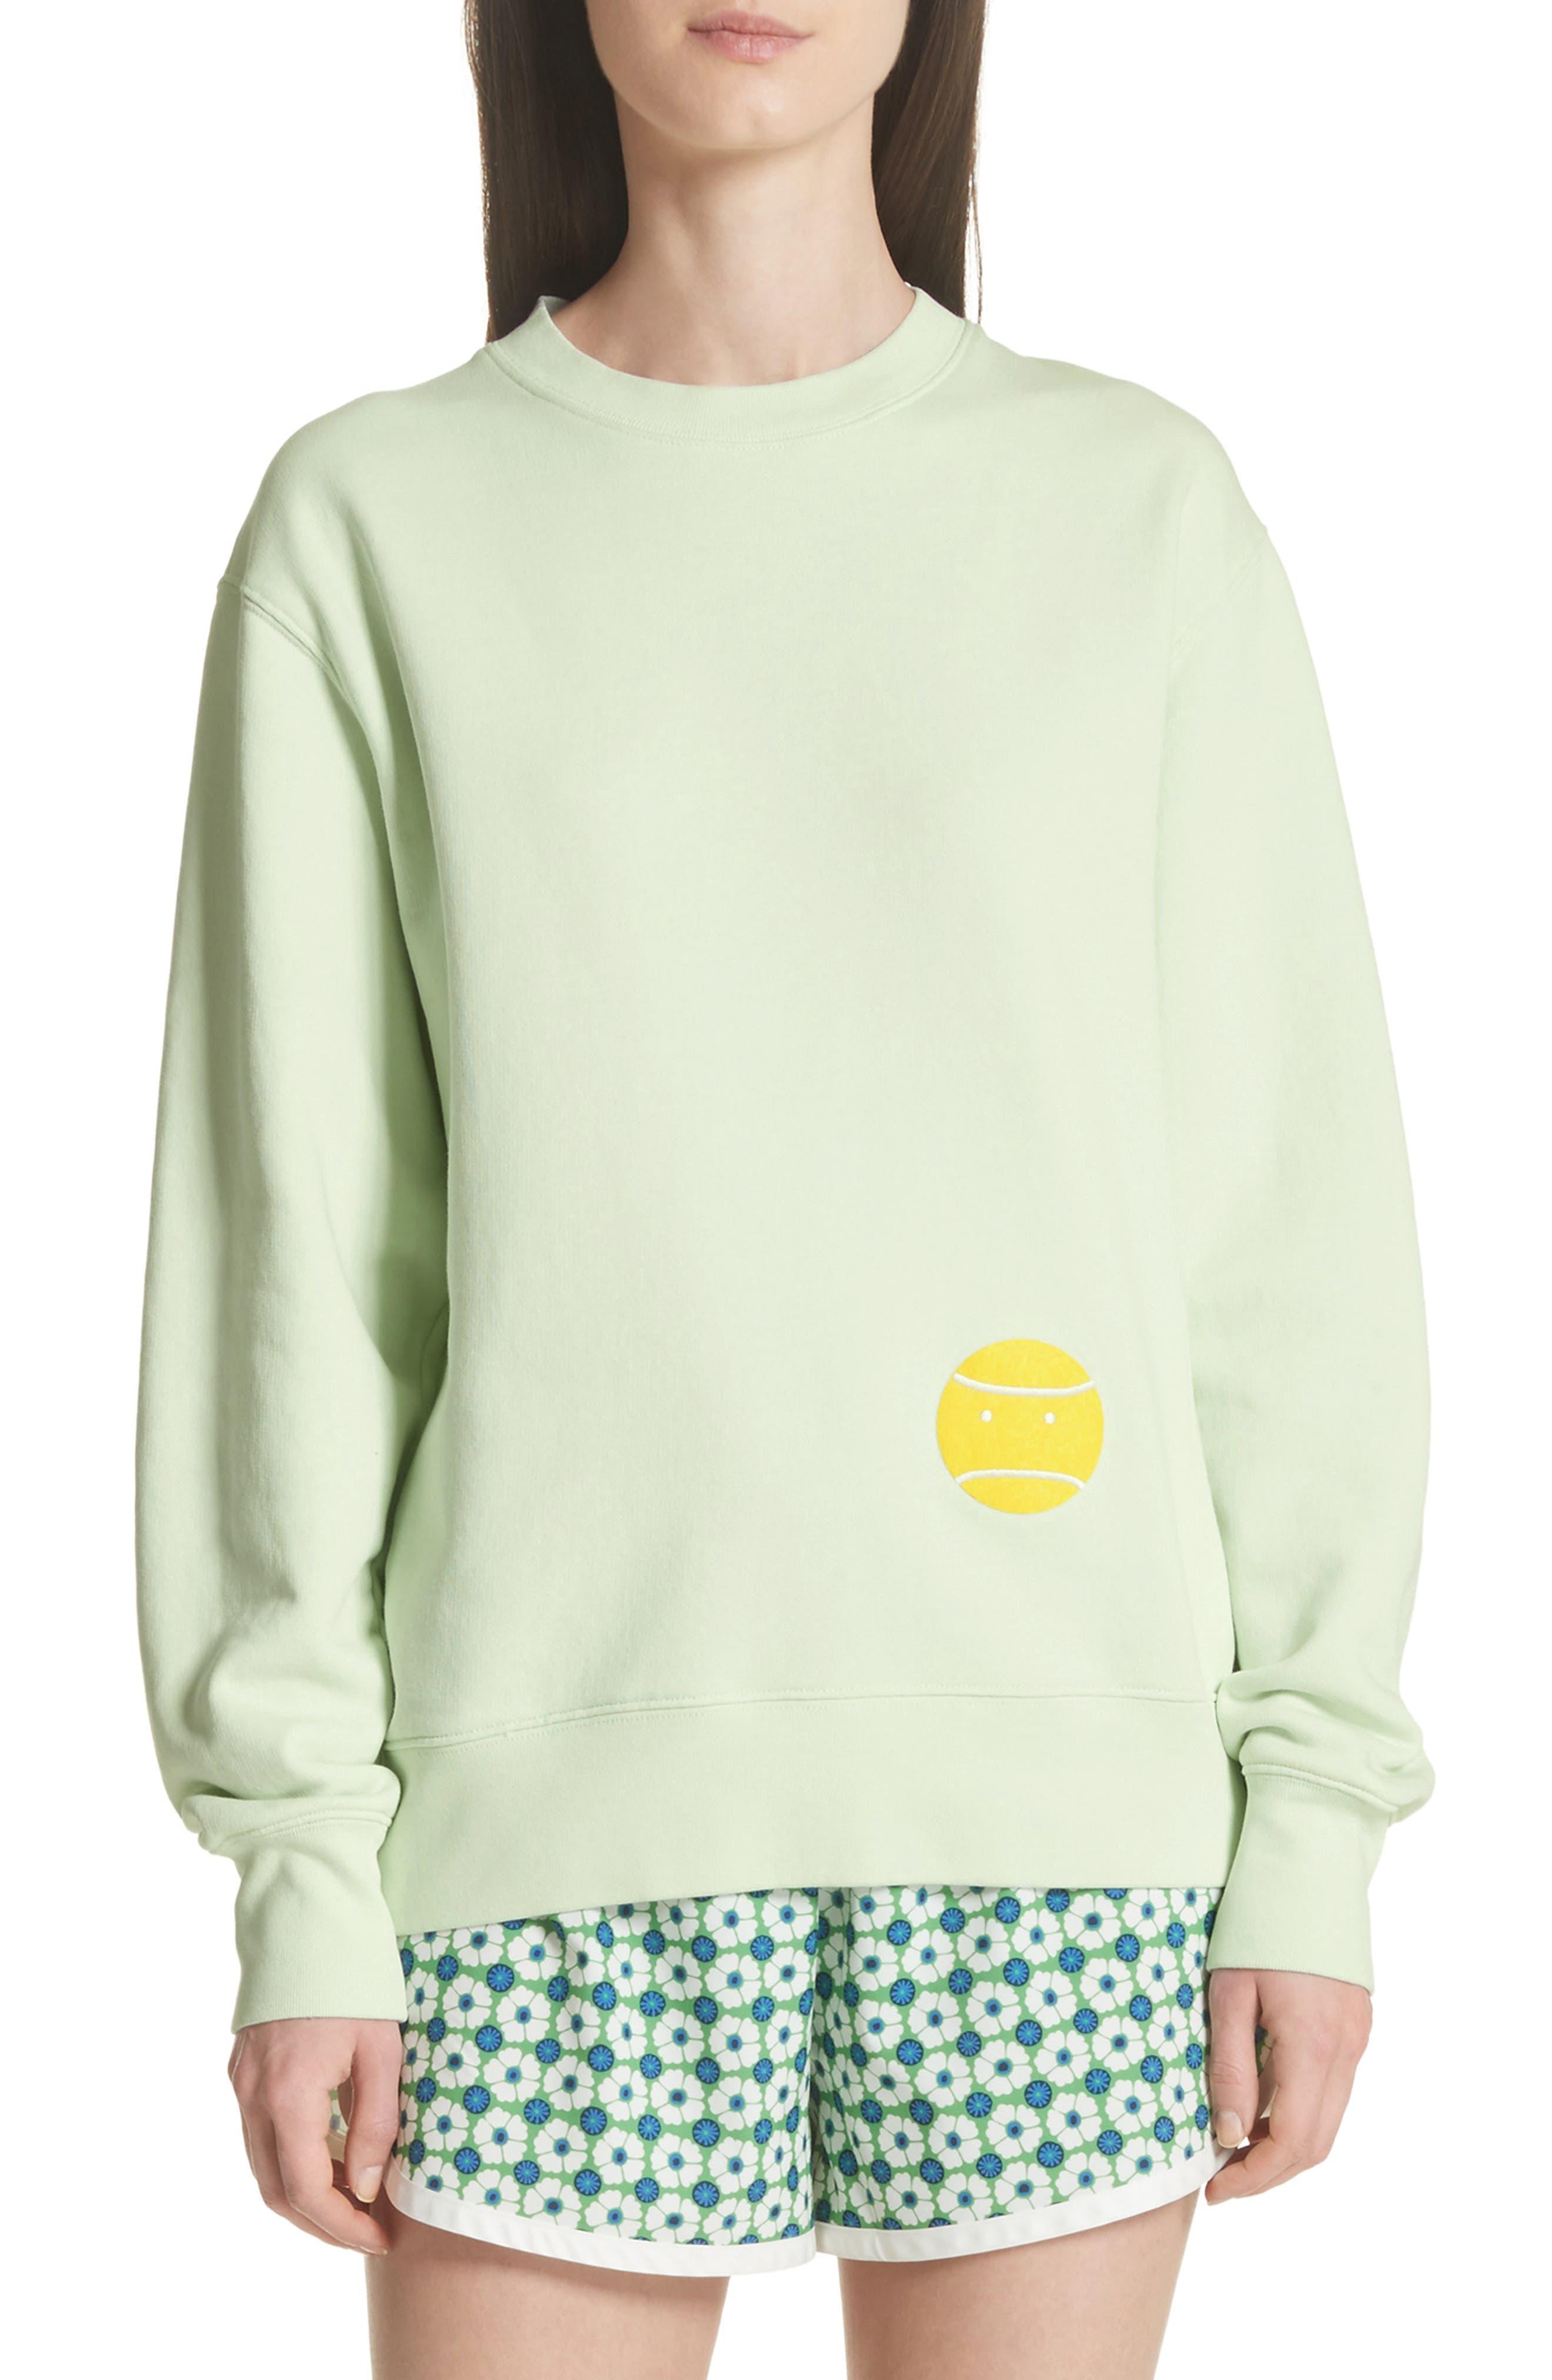 Tory Sport Little Grump French Terry Sweatshirt, Green